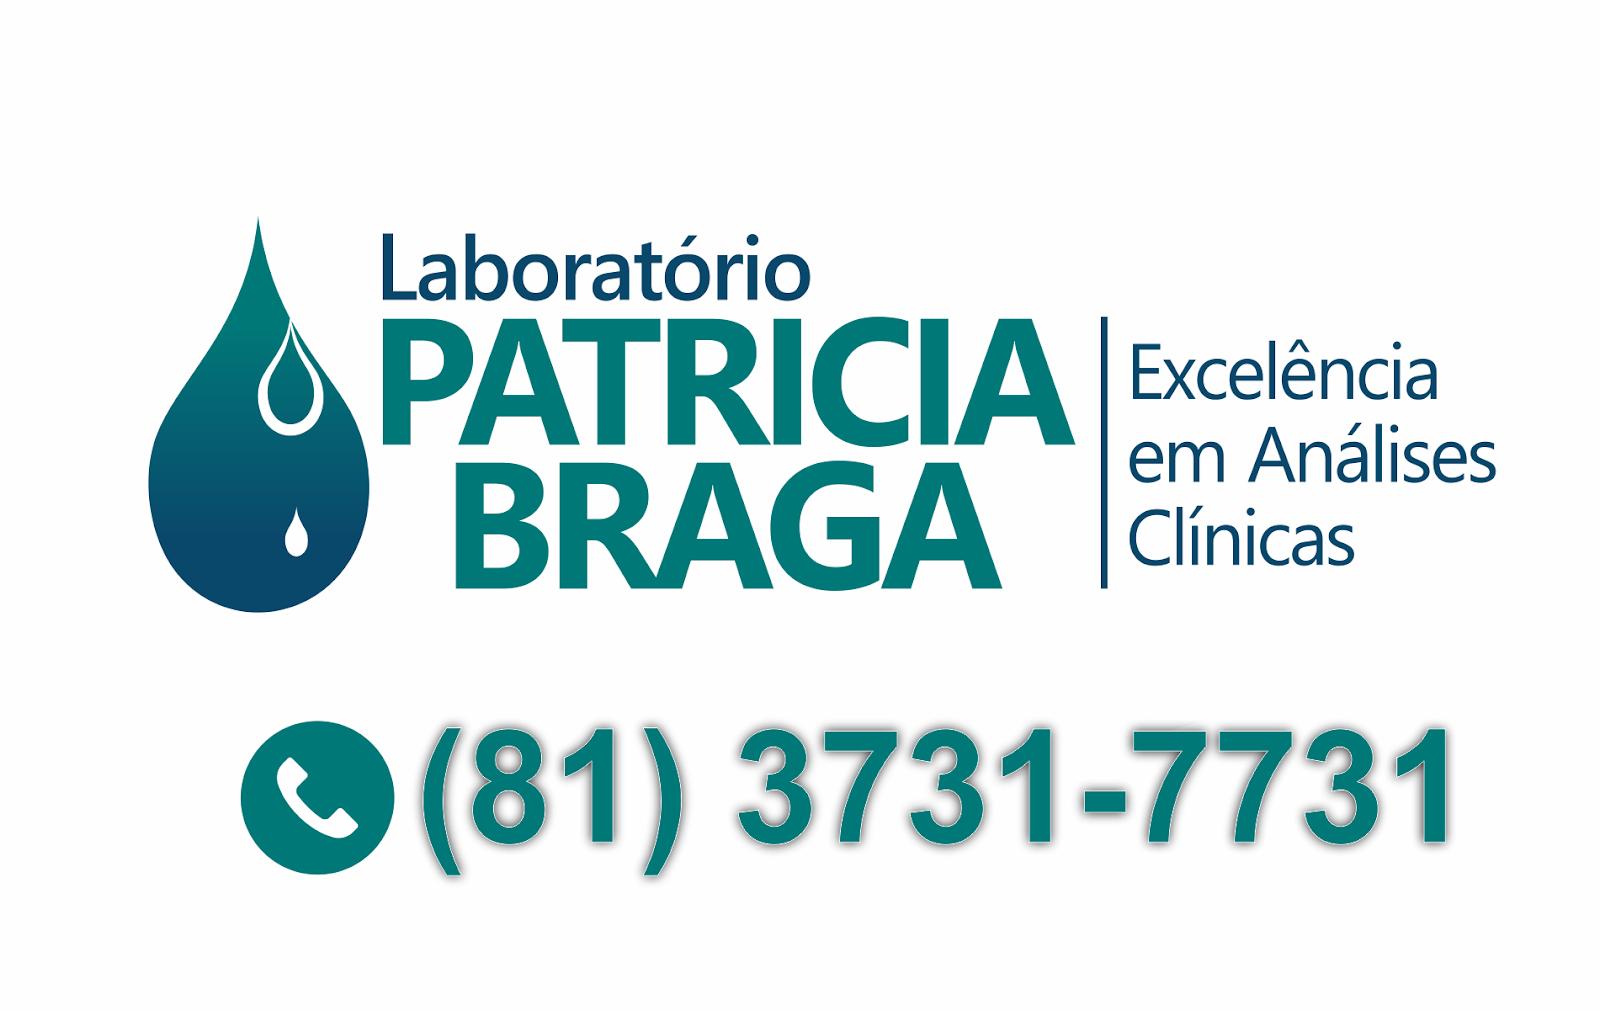 LABORATÓRIO PATRICIA BRAGA